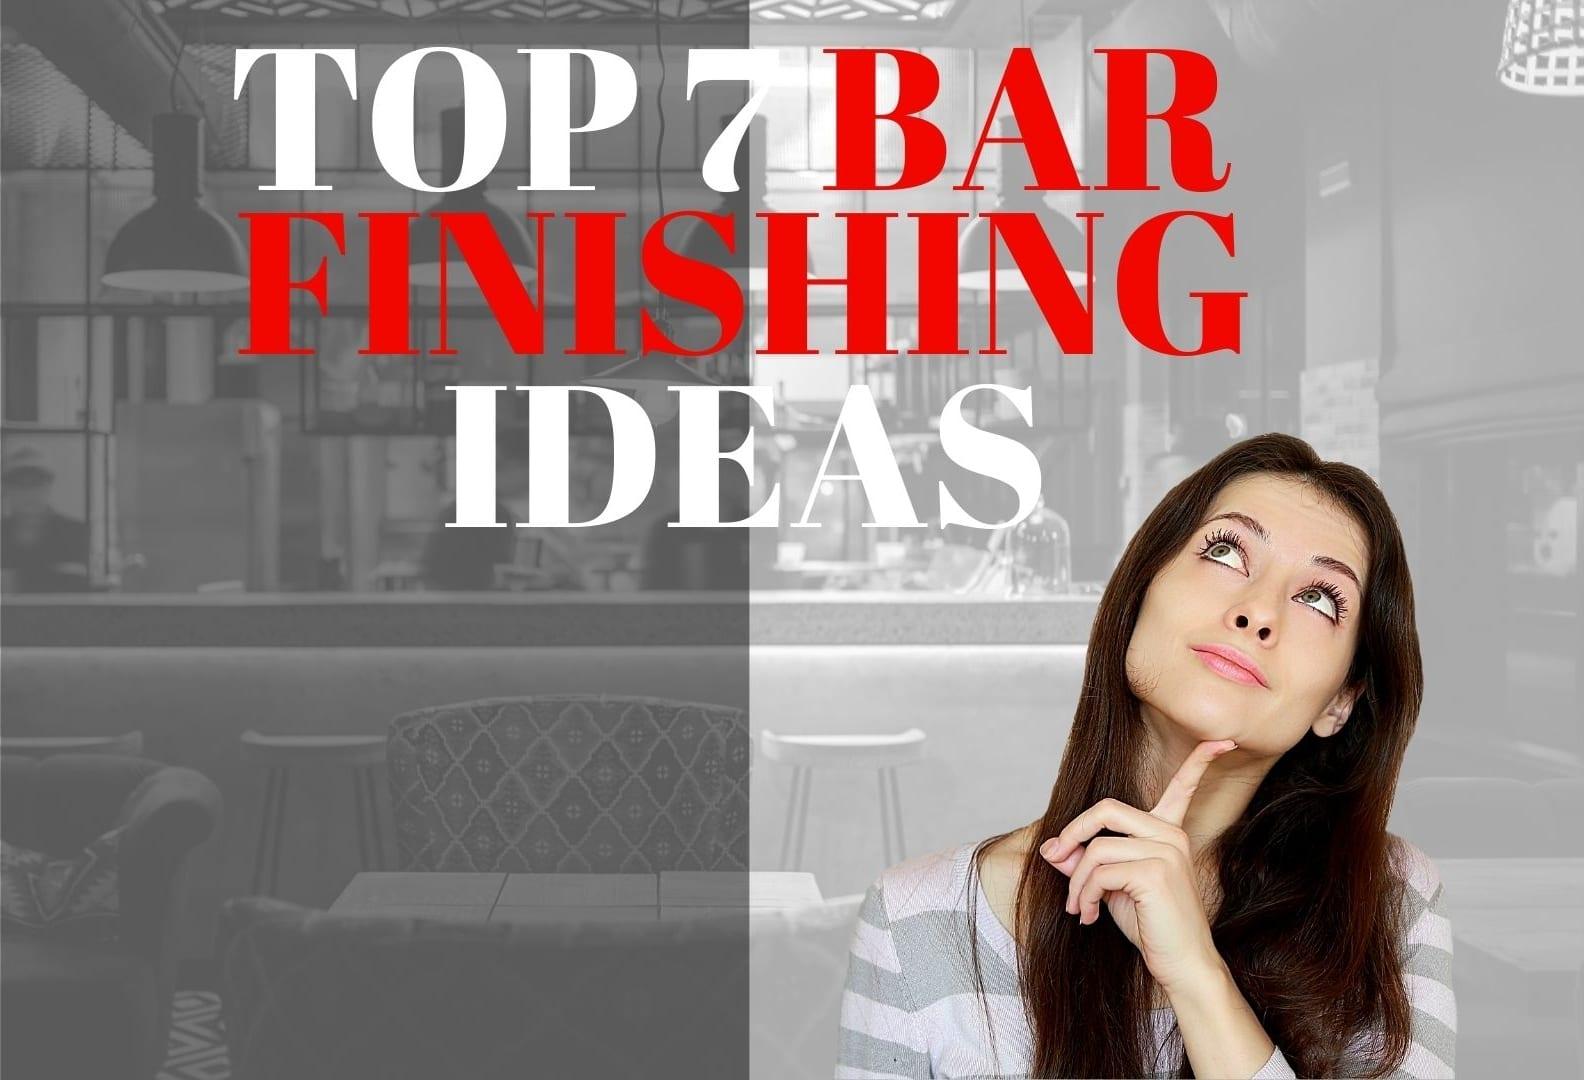 The top 7 bar finishing ideas